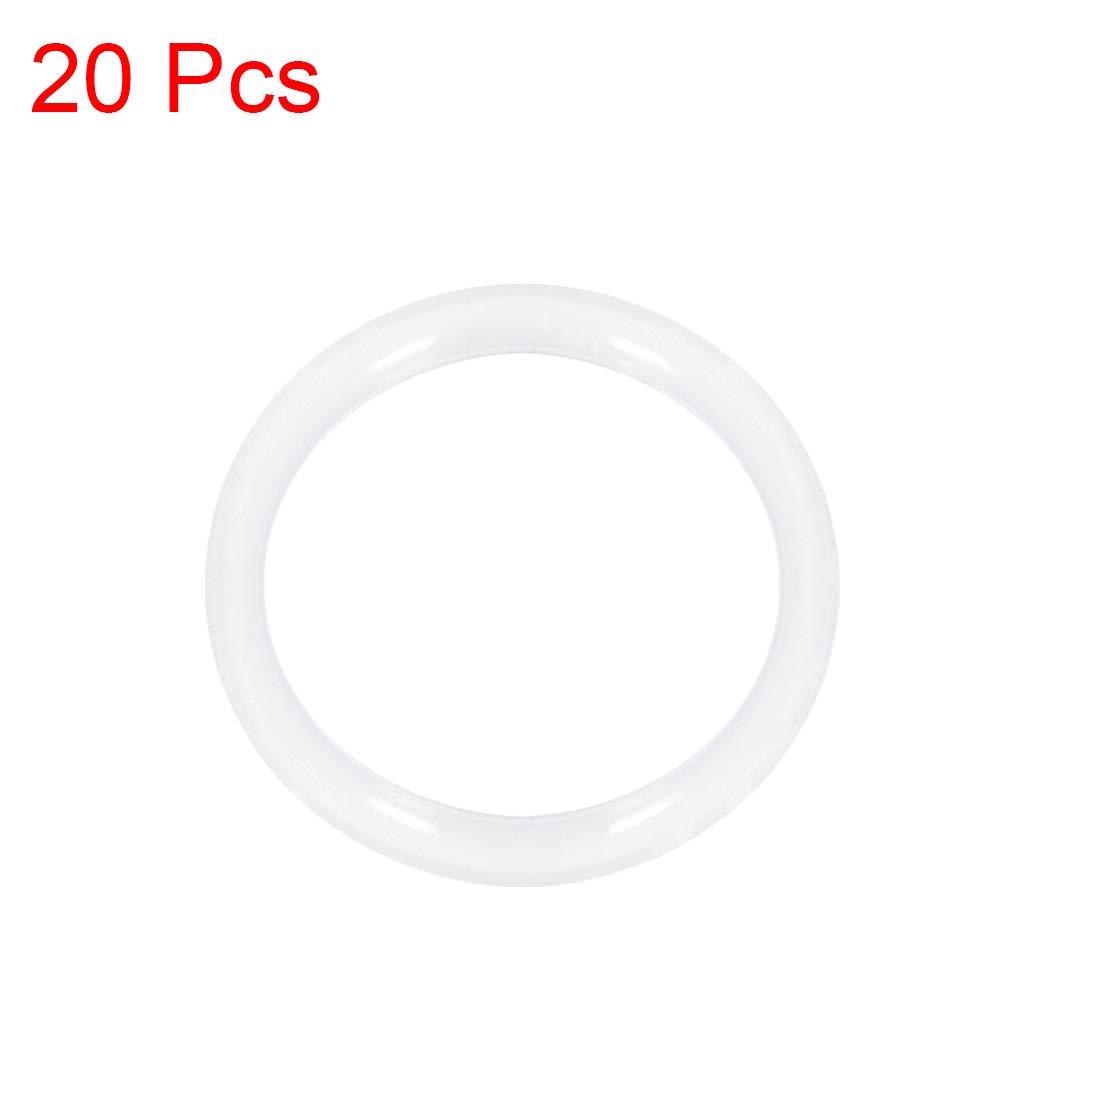 di/ámetro interior de 25 mm di/ámetro de 31 mm ancho de 3 mm junta de sello 20 piezas sourcing map juntas t/óricas de silicona